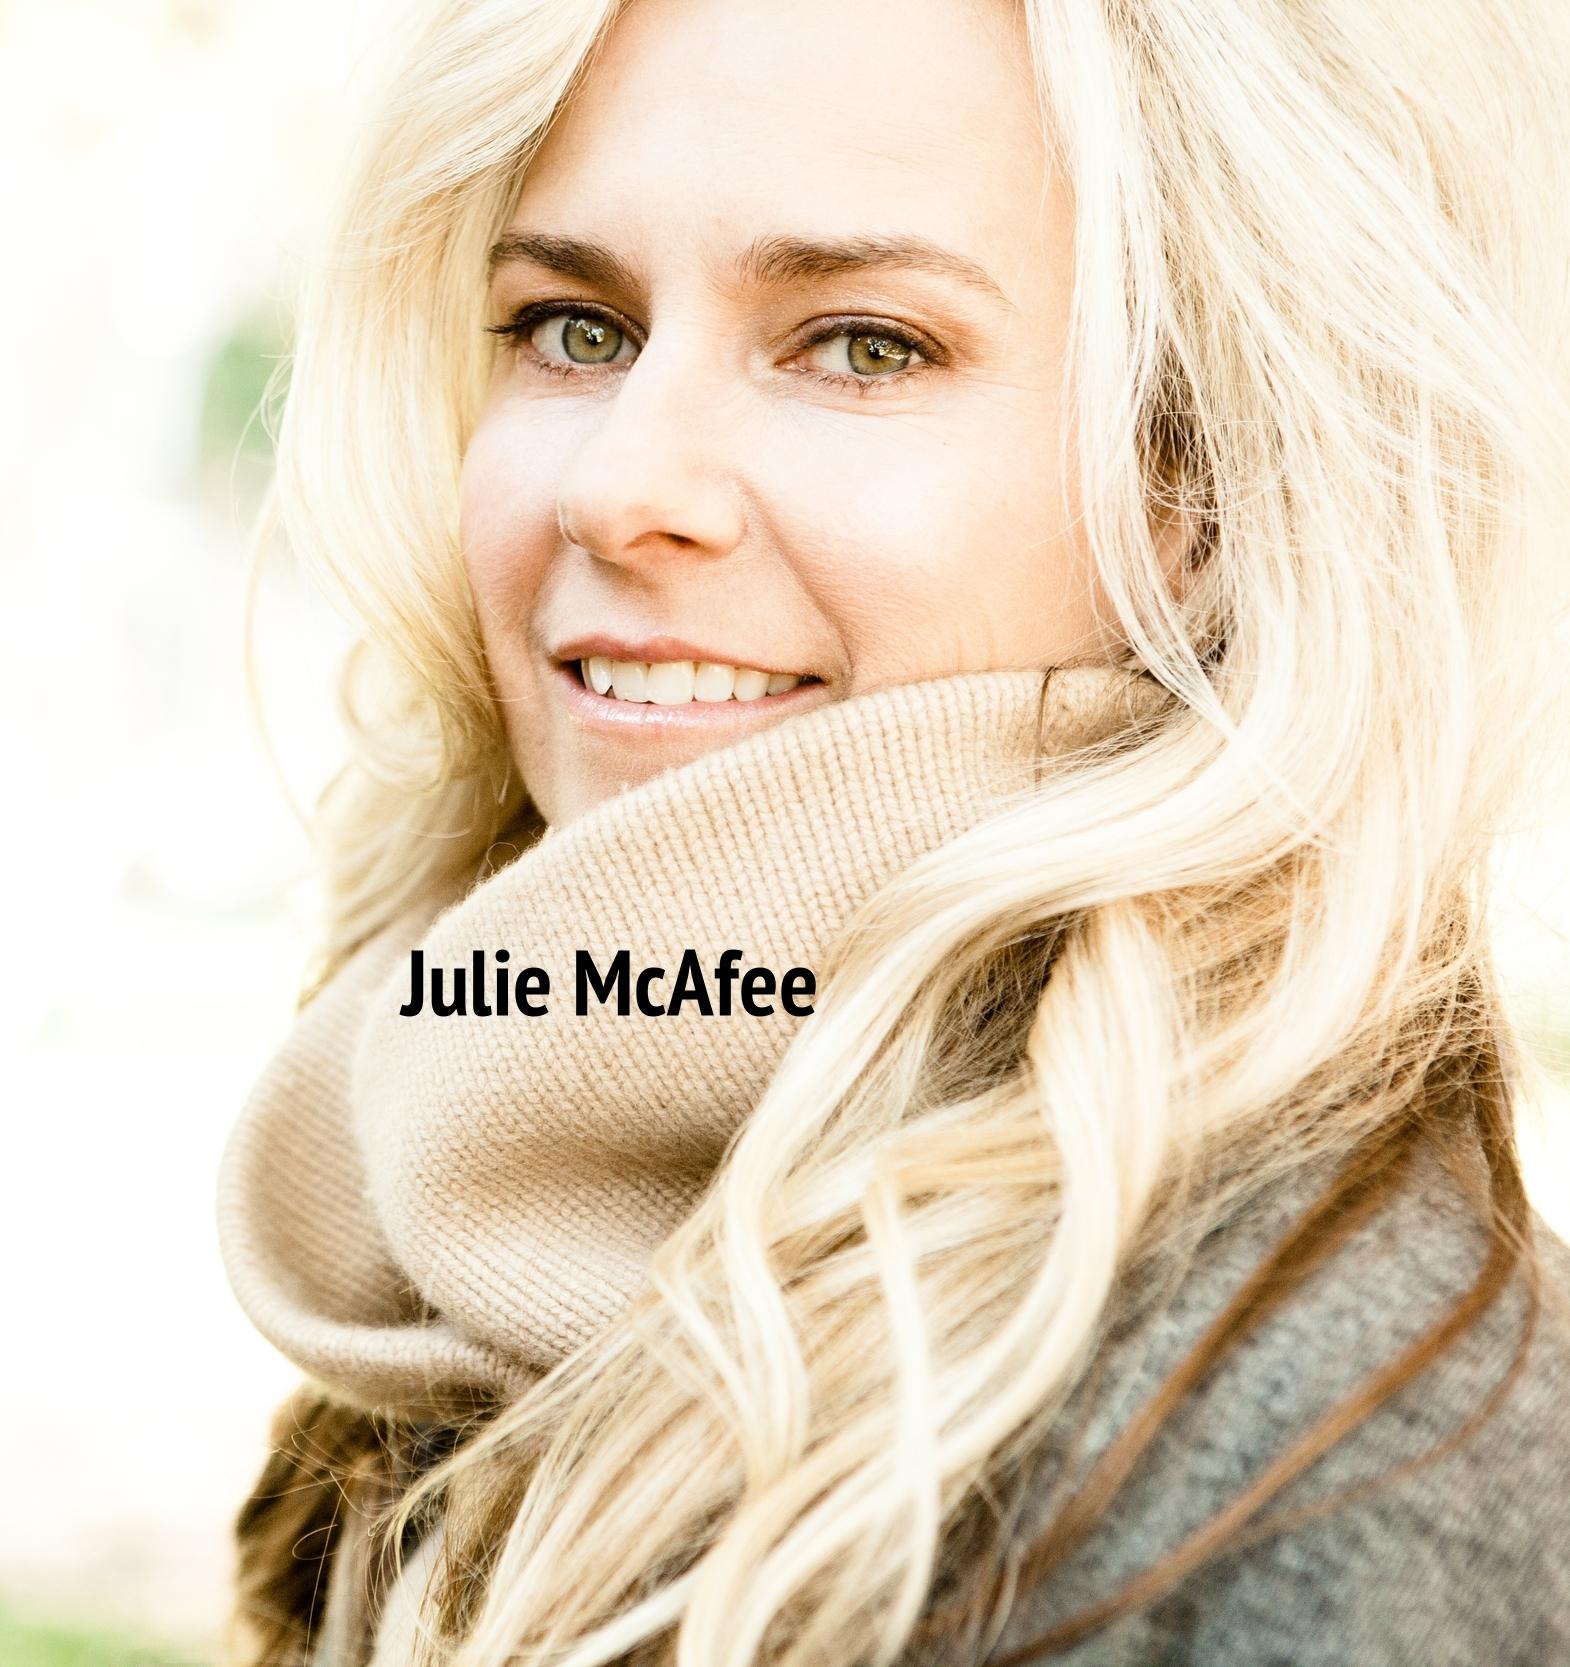 Julie McAfee